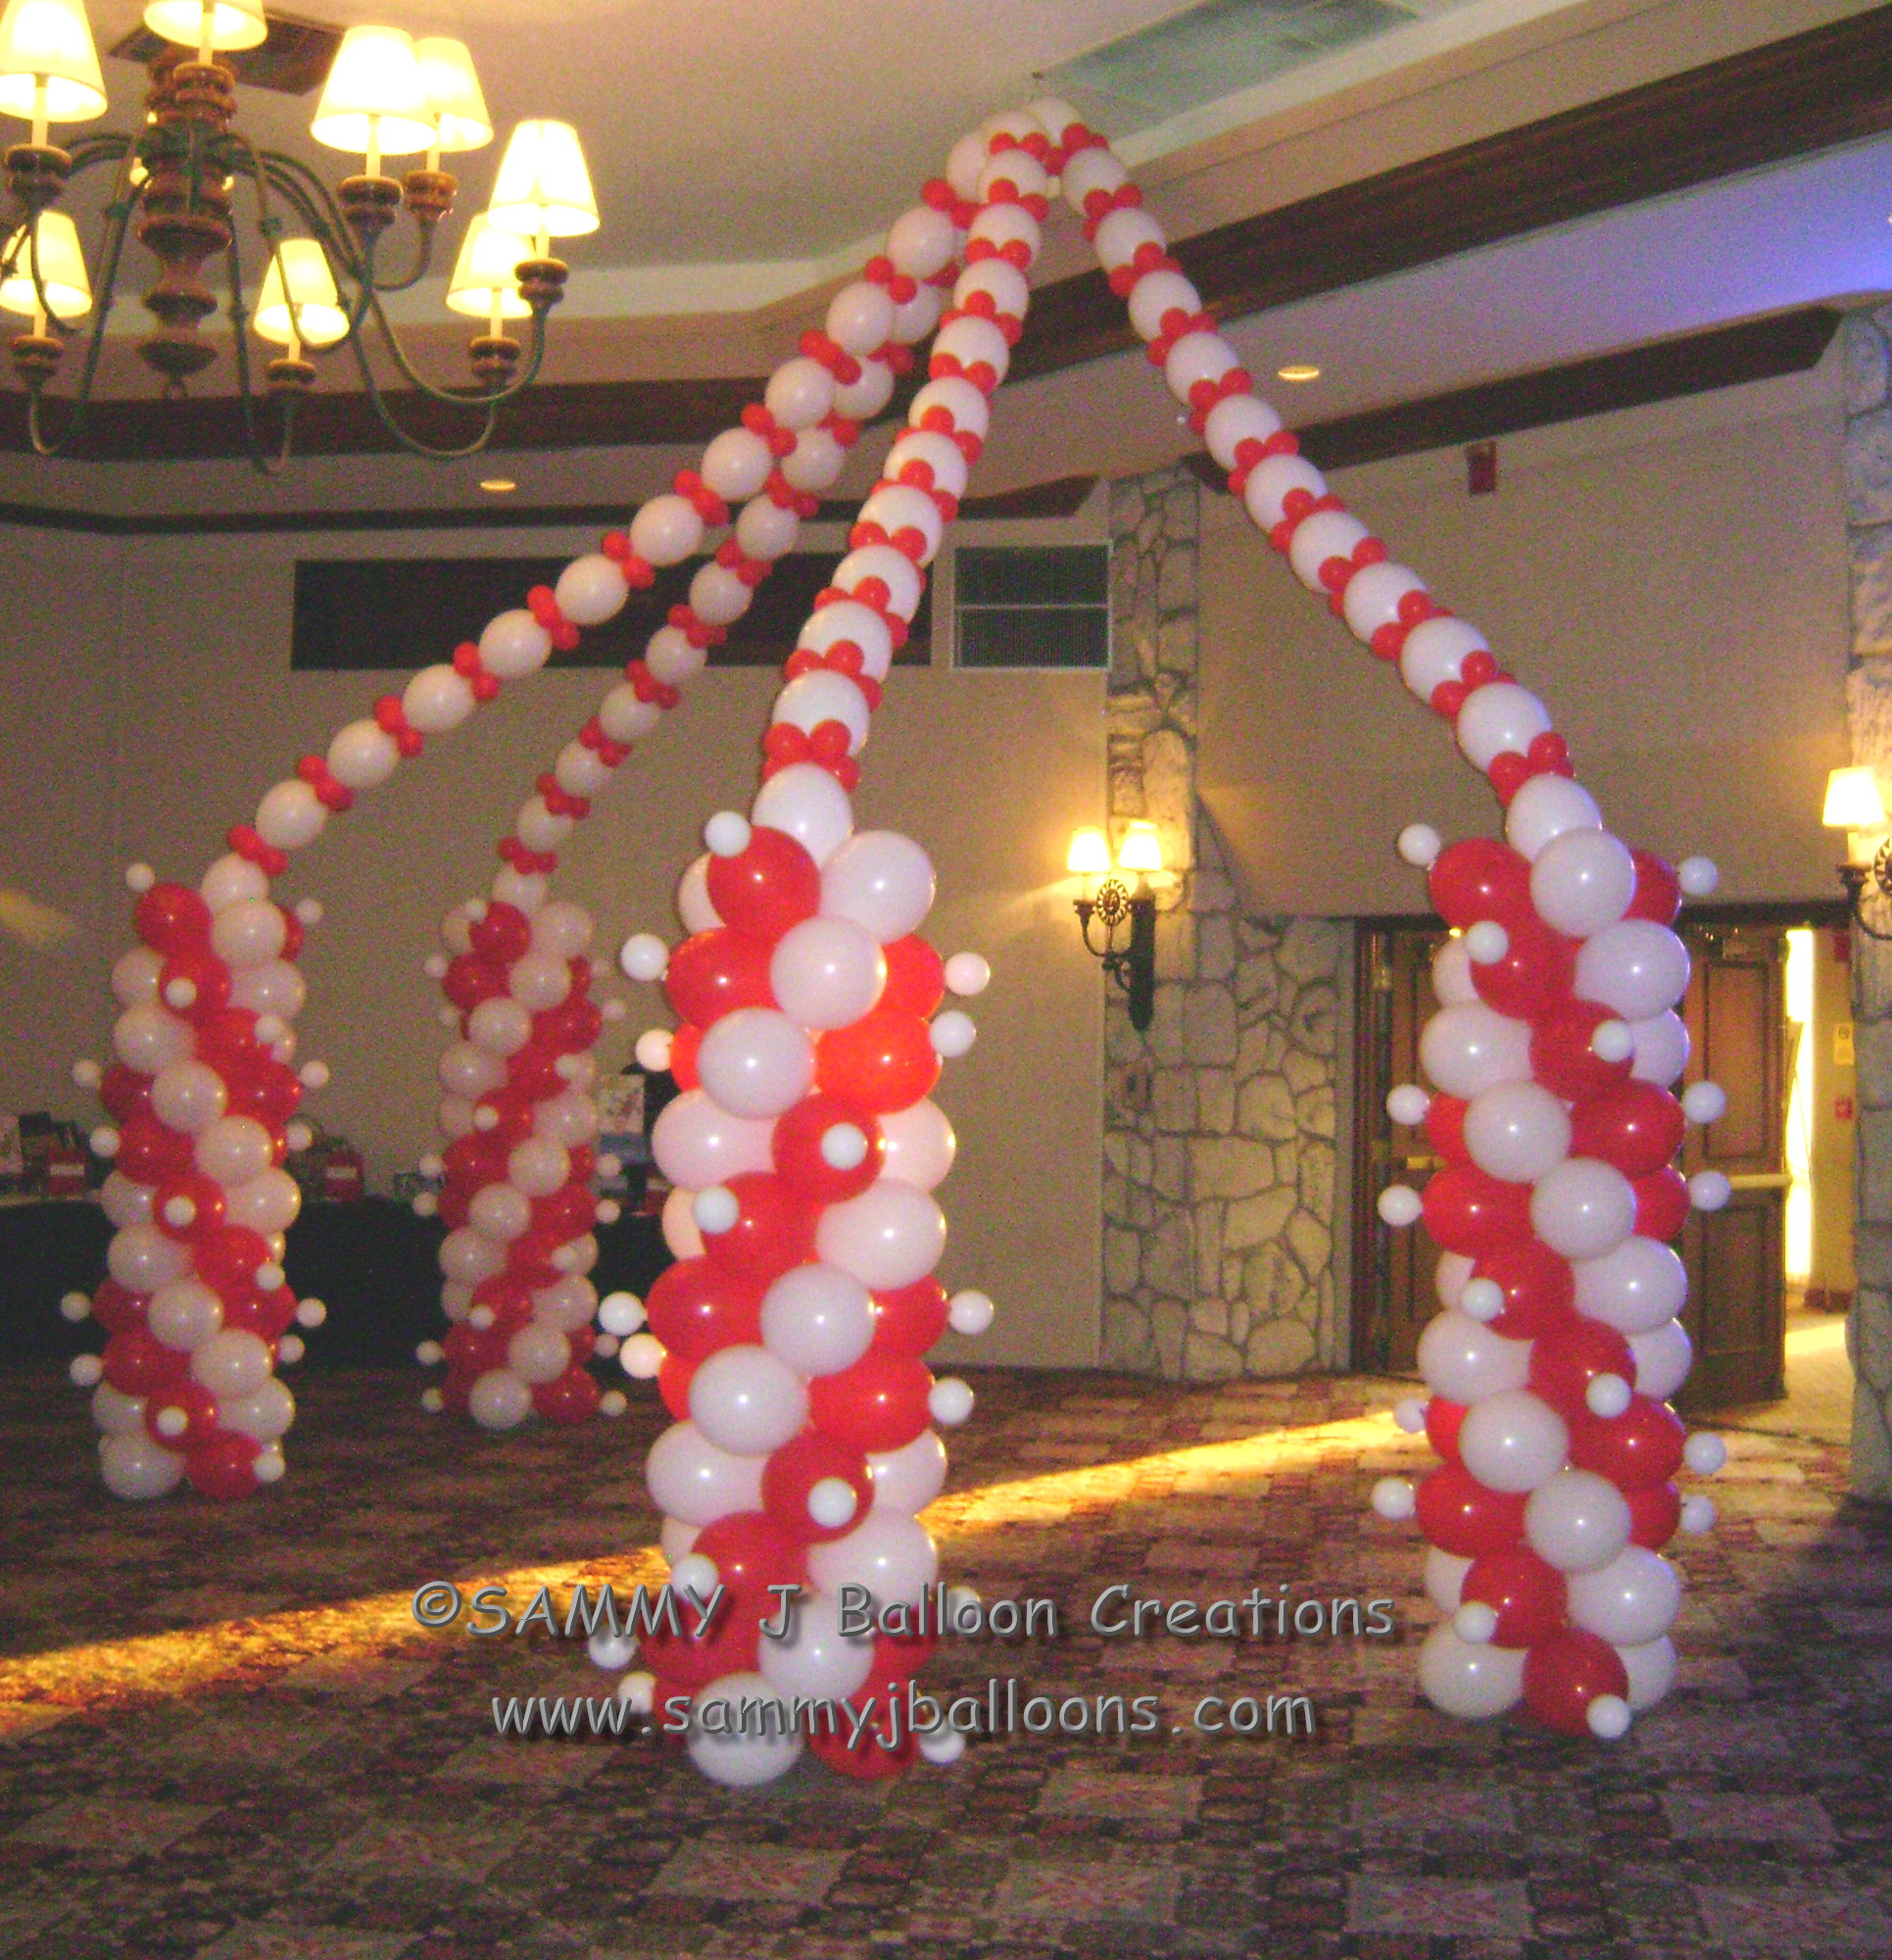 SAMMY J Balloon Creations st louis balloons circus tent column